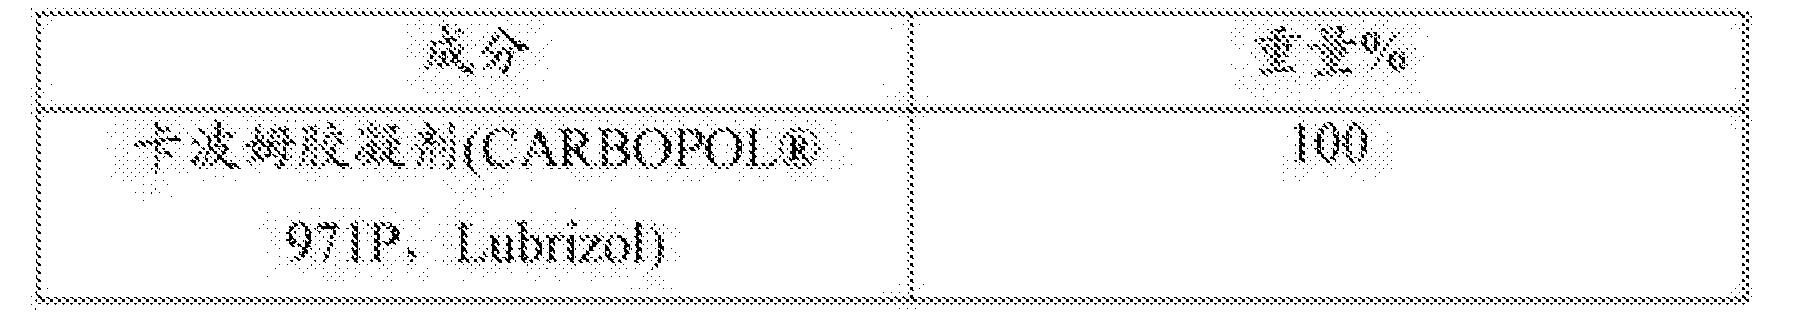 Figure CN107310856AD00261